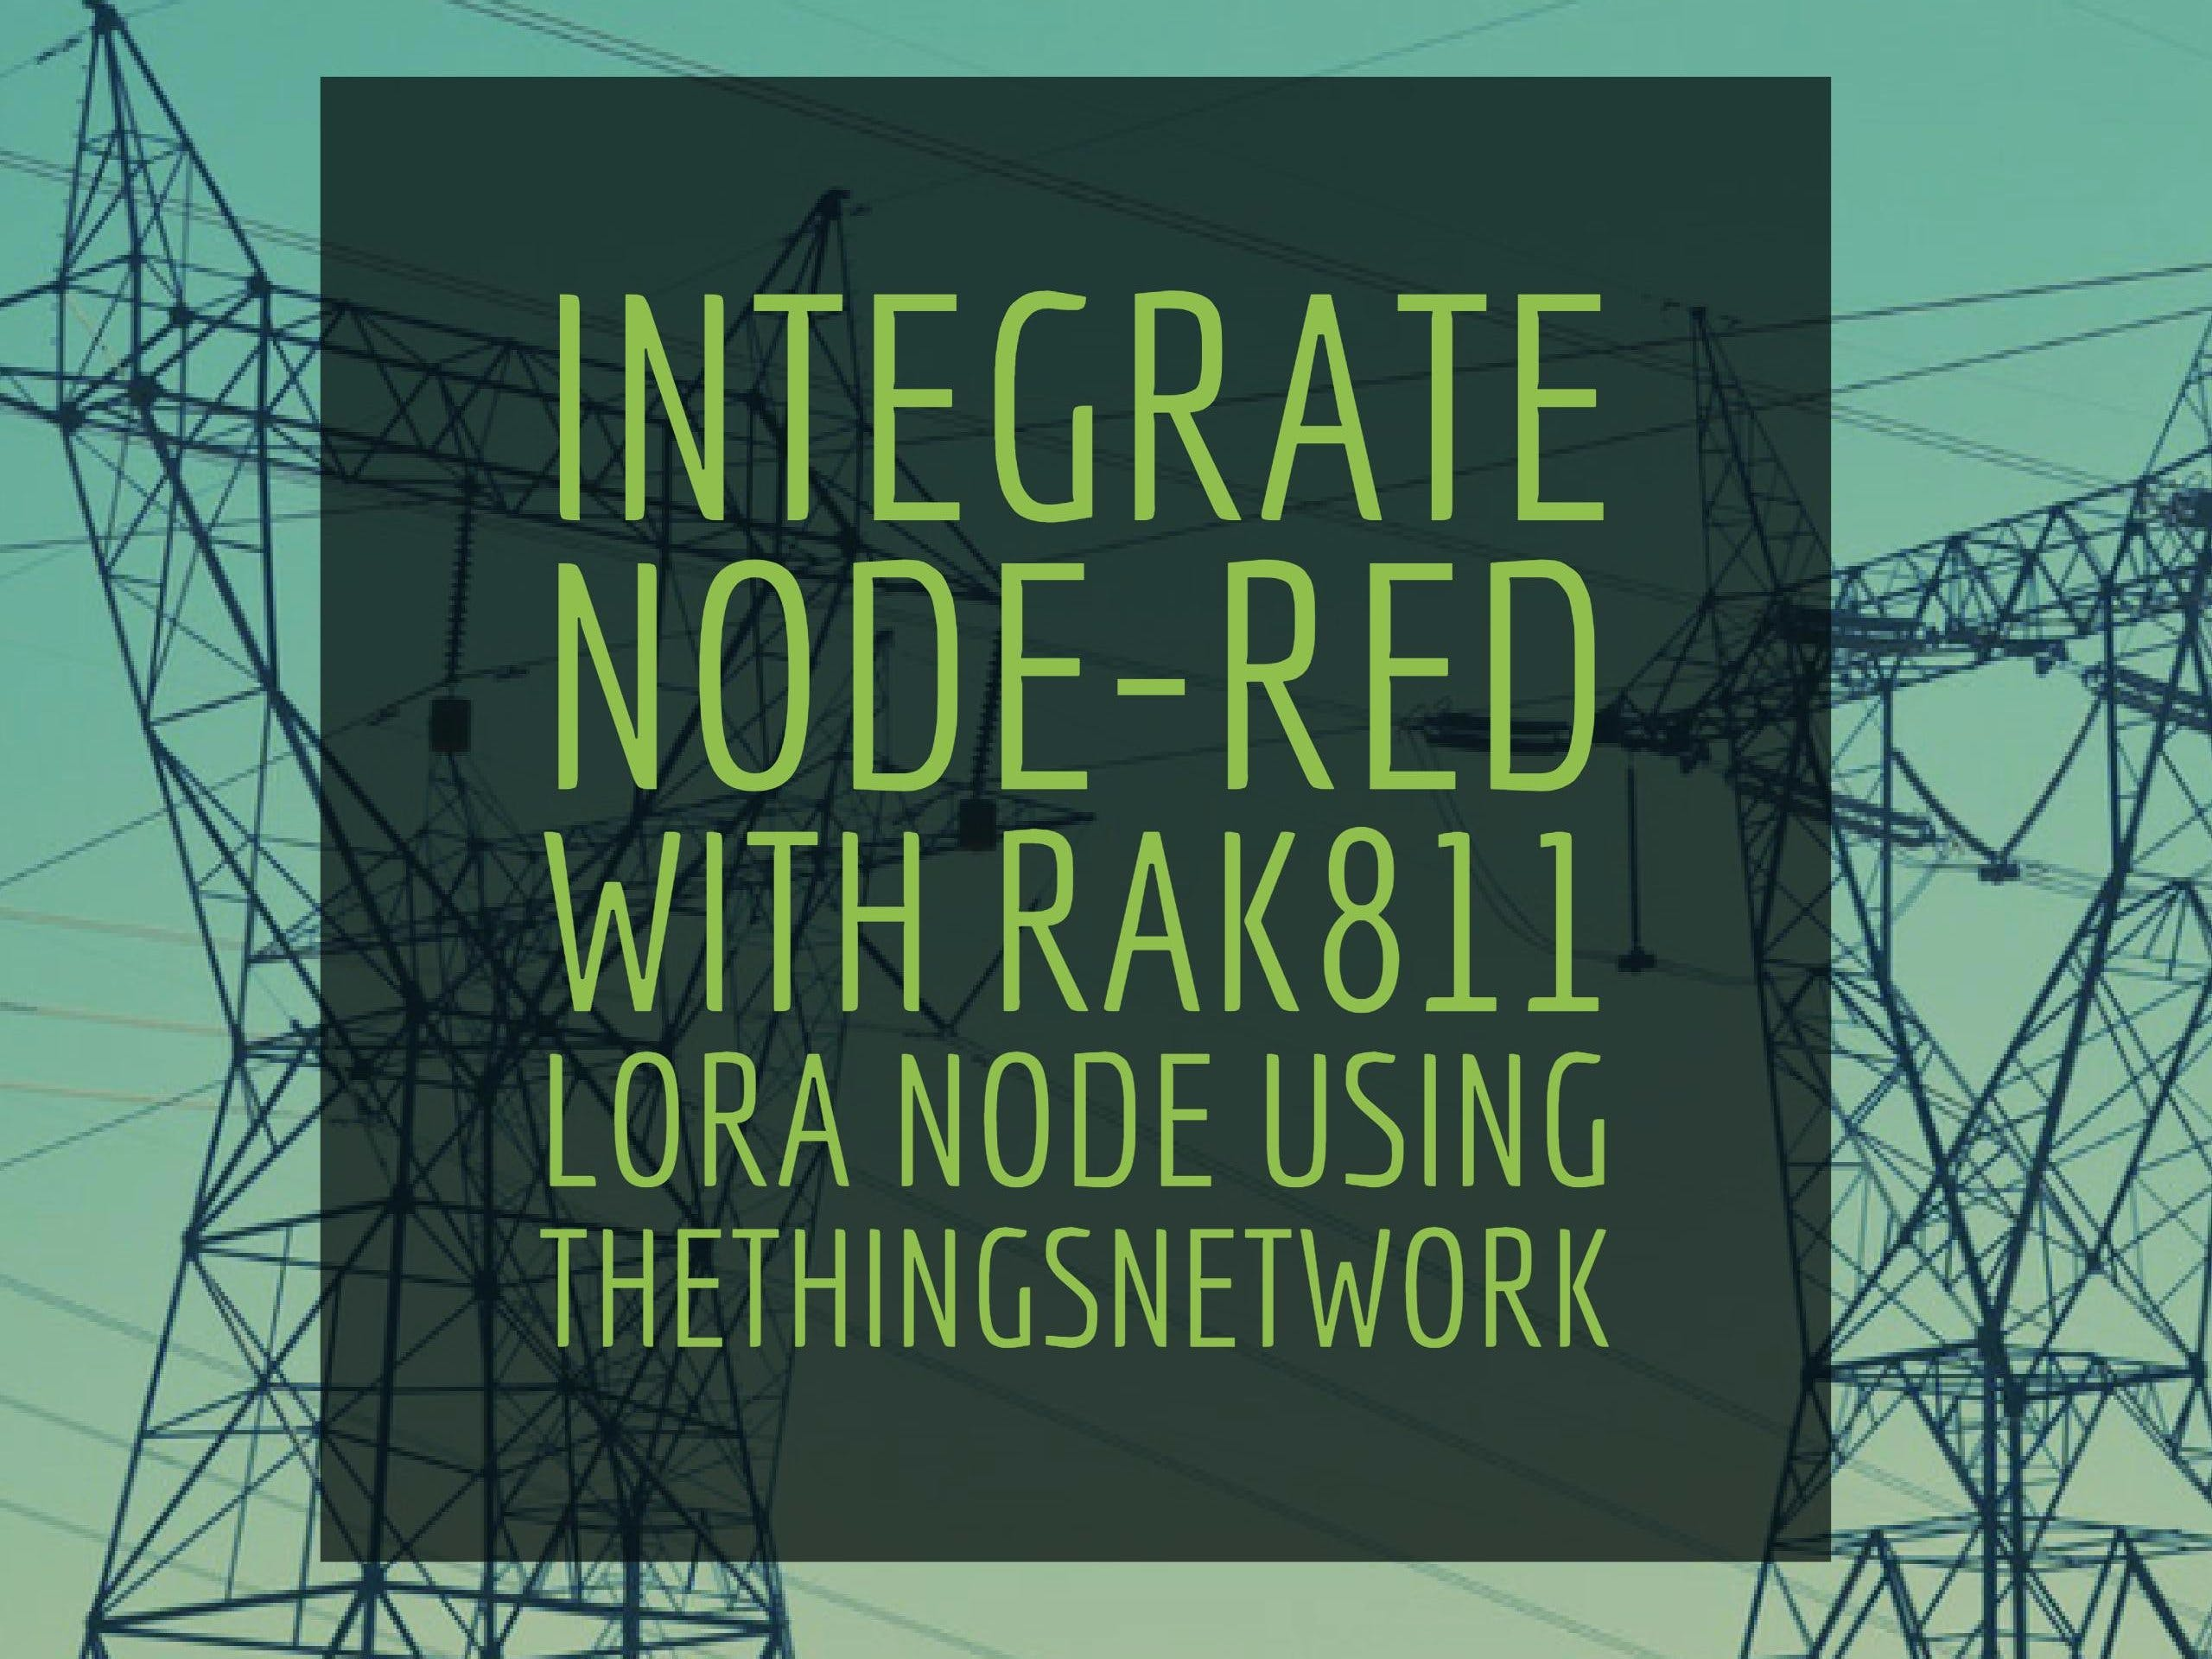 Integrate Node-RED with RAK811 LoRA Node Using the TTN